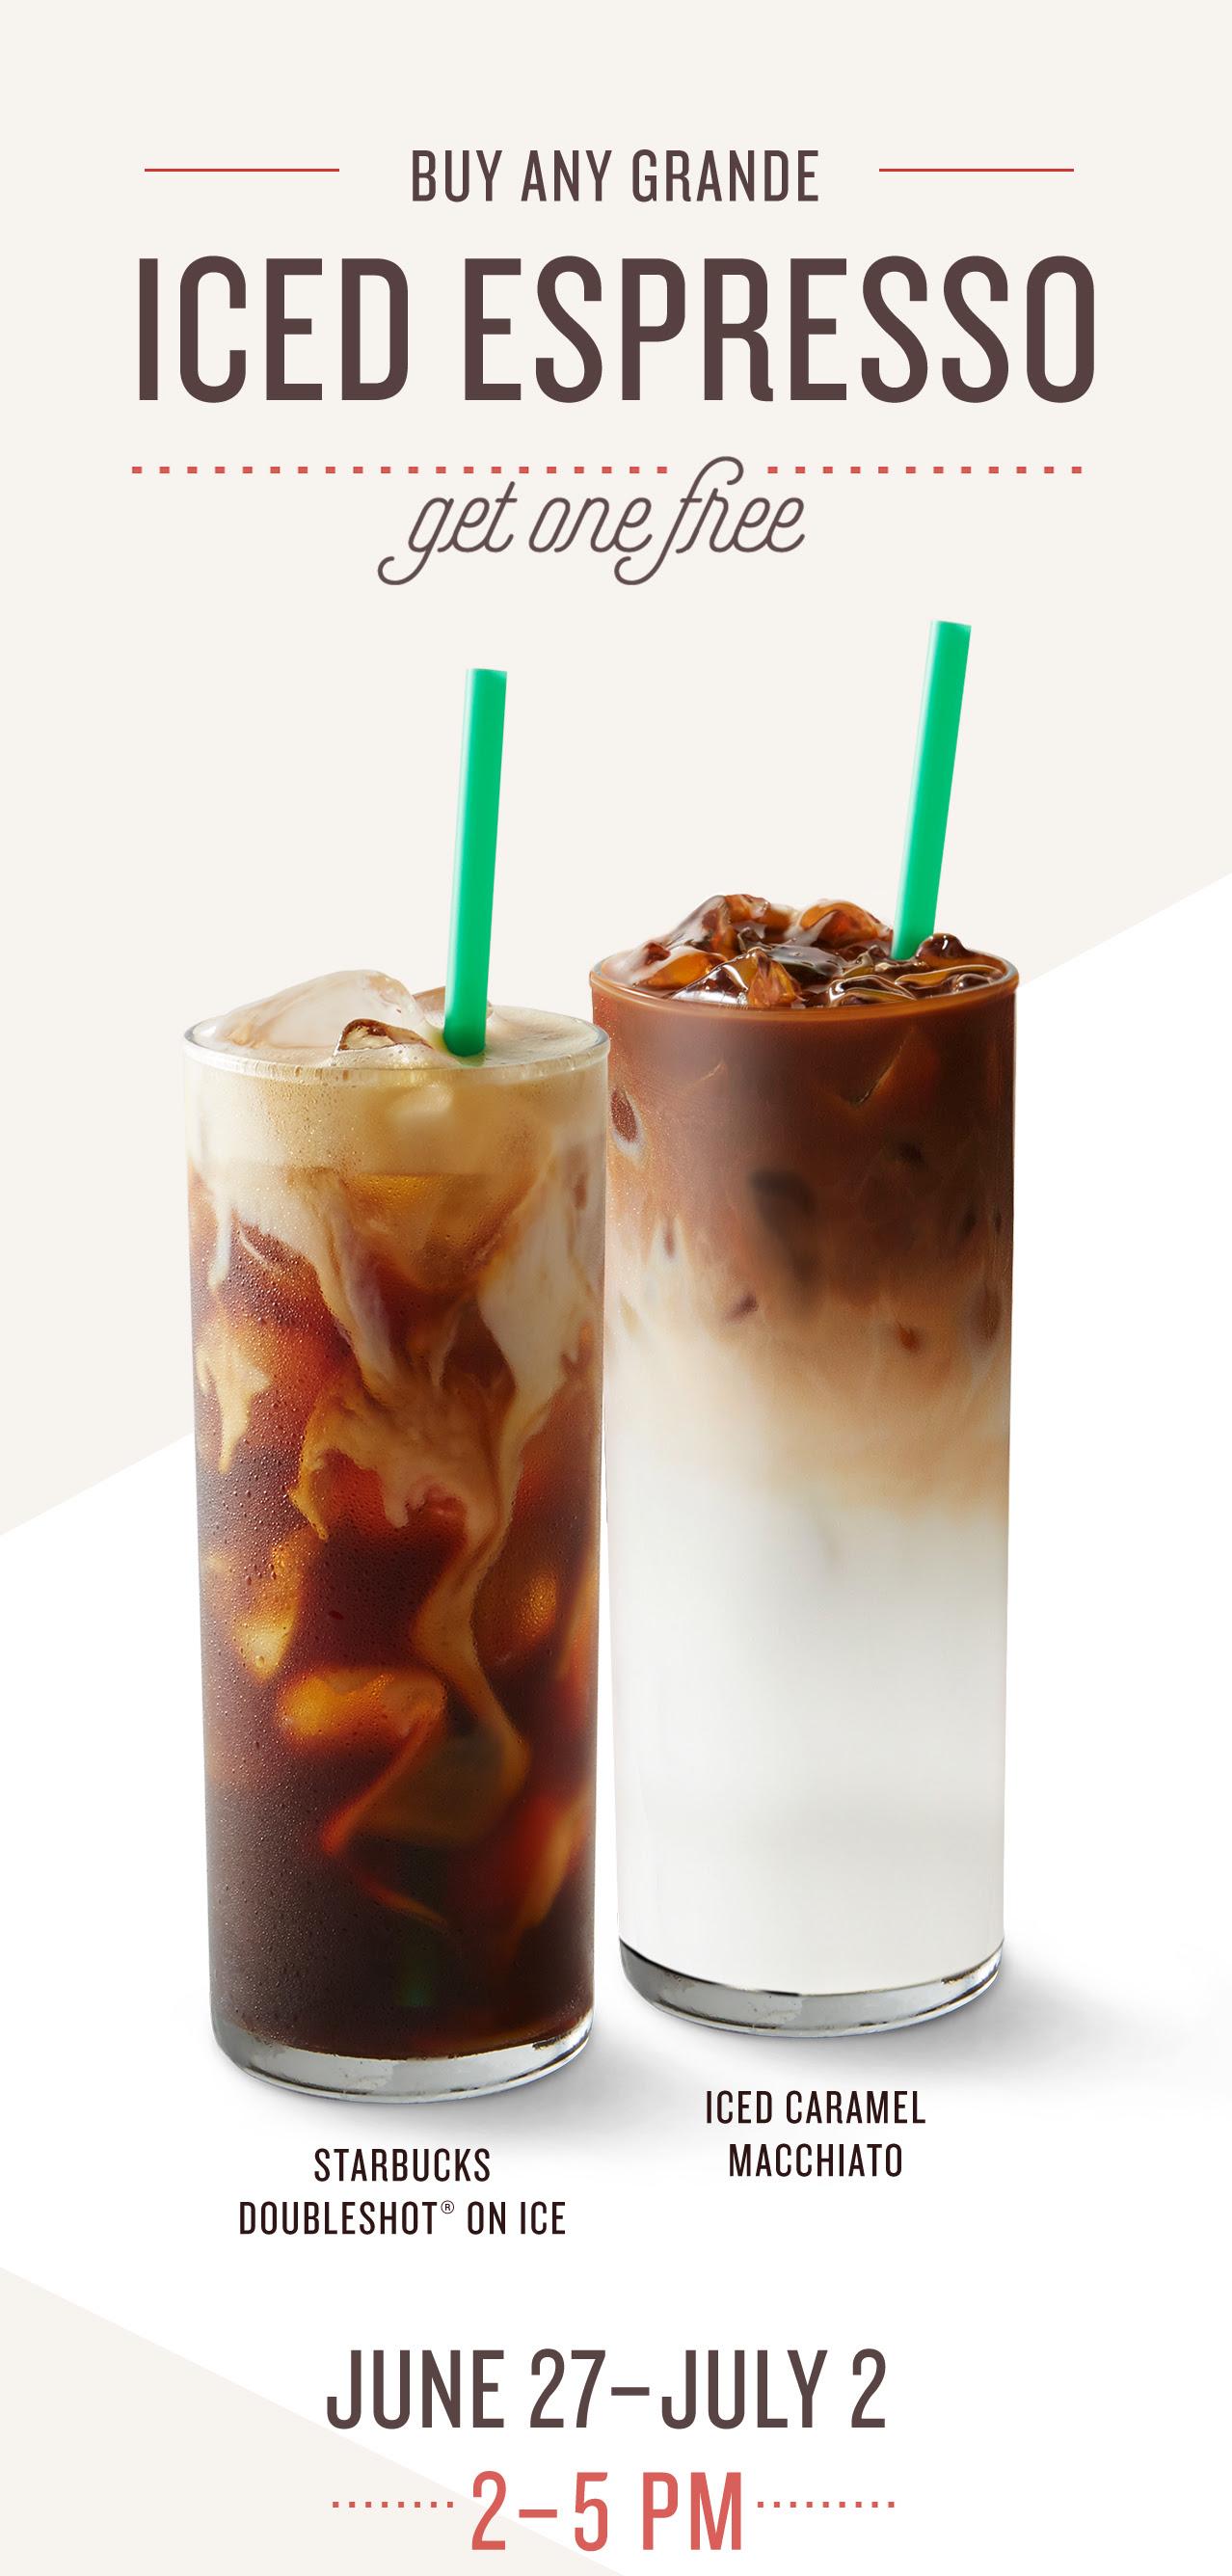 Buy Any Grande Iced Espresso Get one Free  Starbucks Doubleshot® On Ice  Iced Caramel Macchiato  June 27 – July 2, 2 – 5 PM